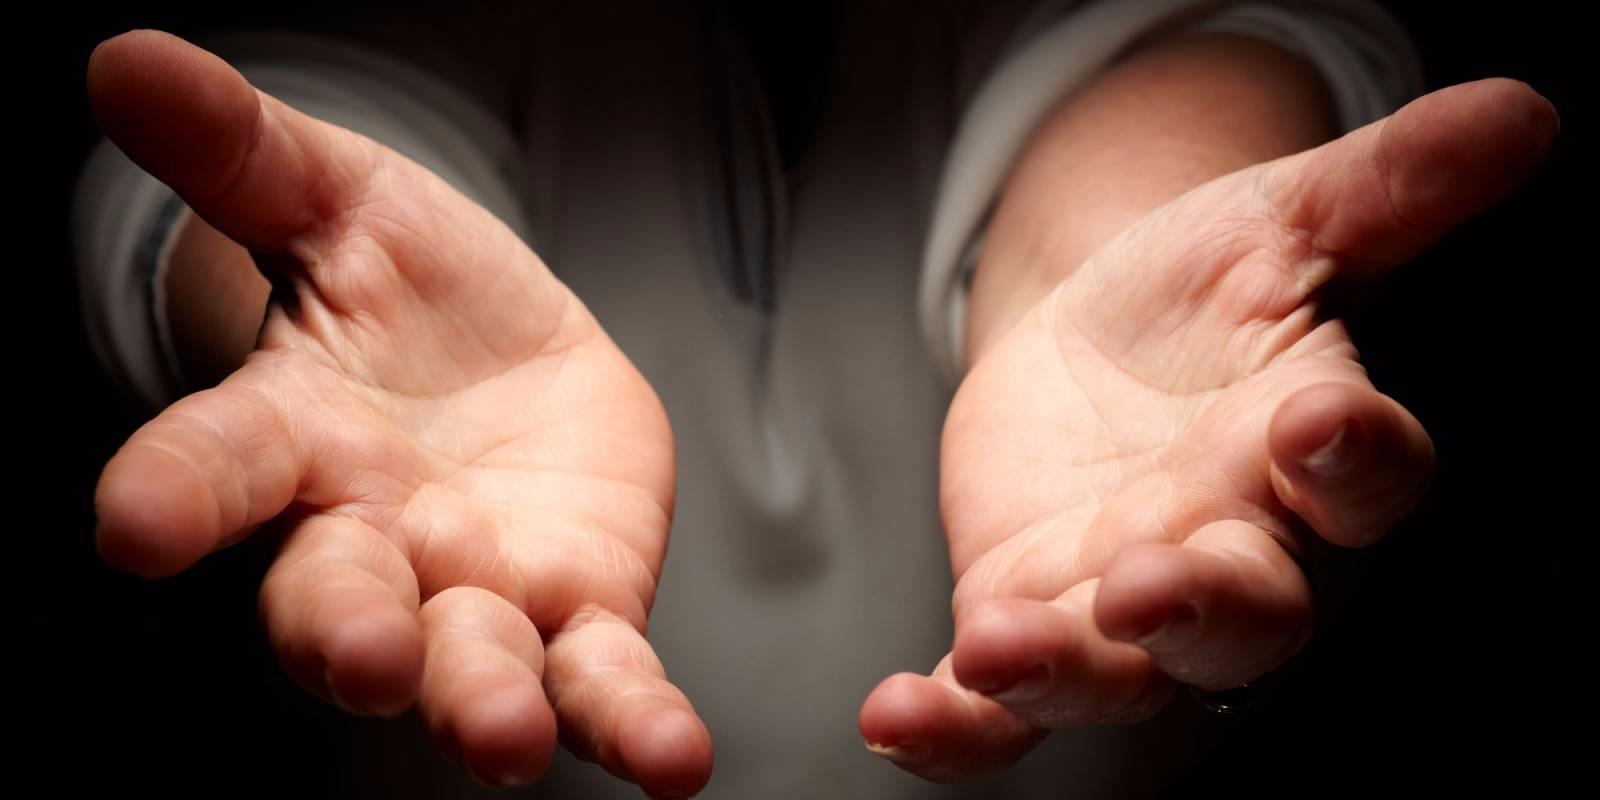 Дающие руки картинки